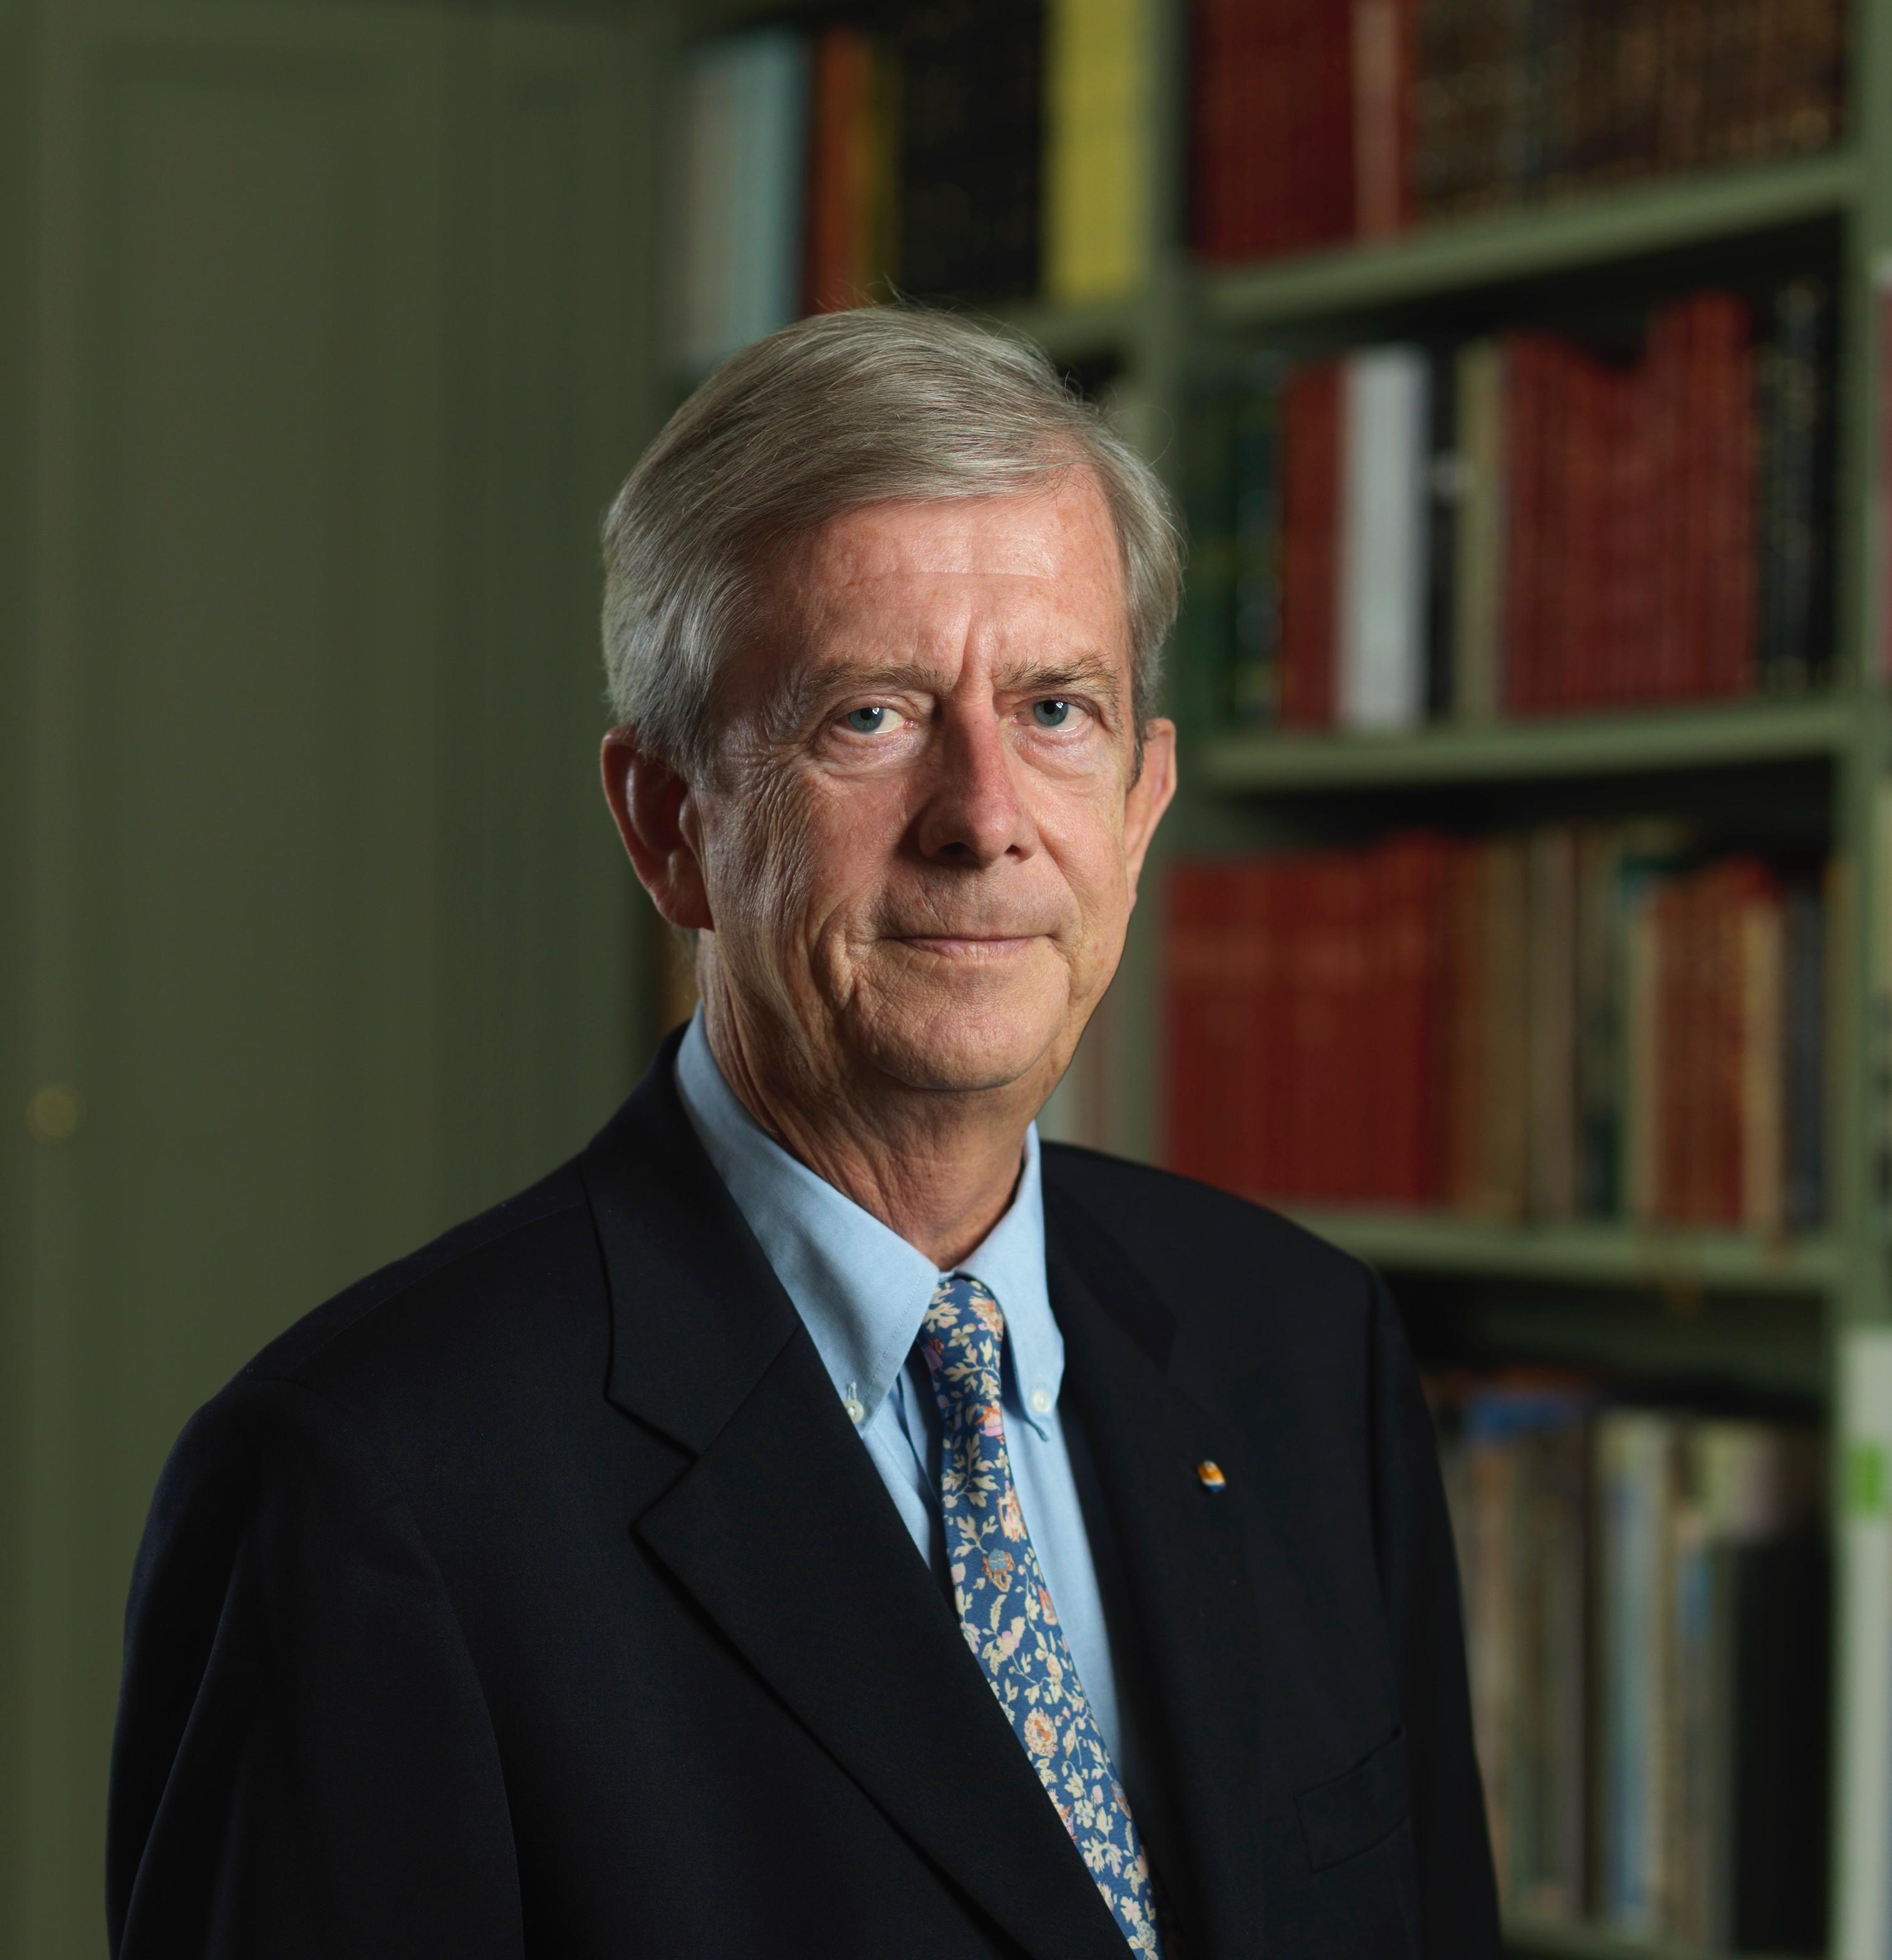 Dr. Nikolaos van Dam